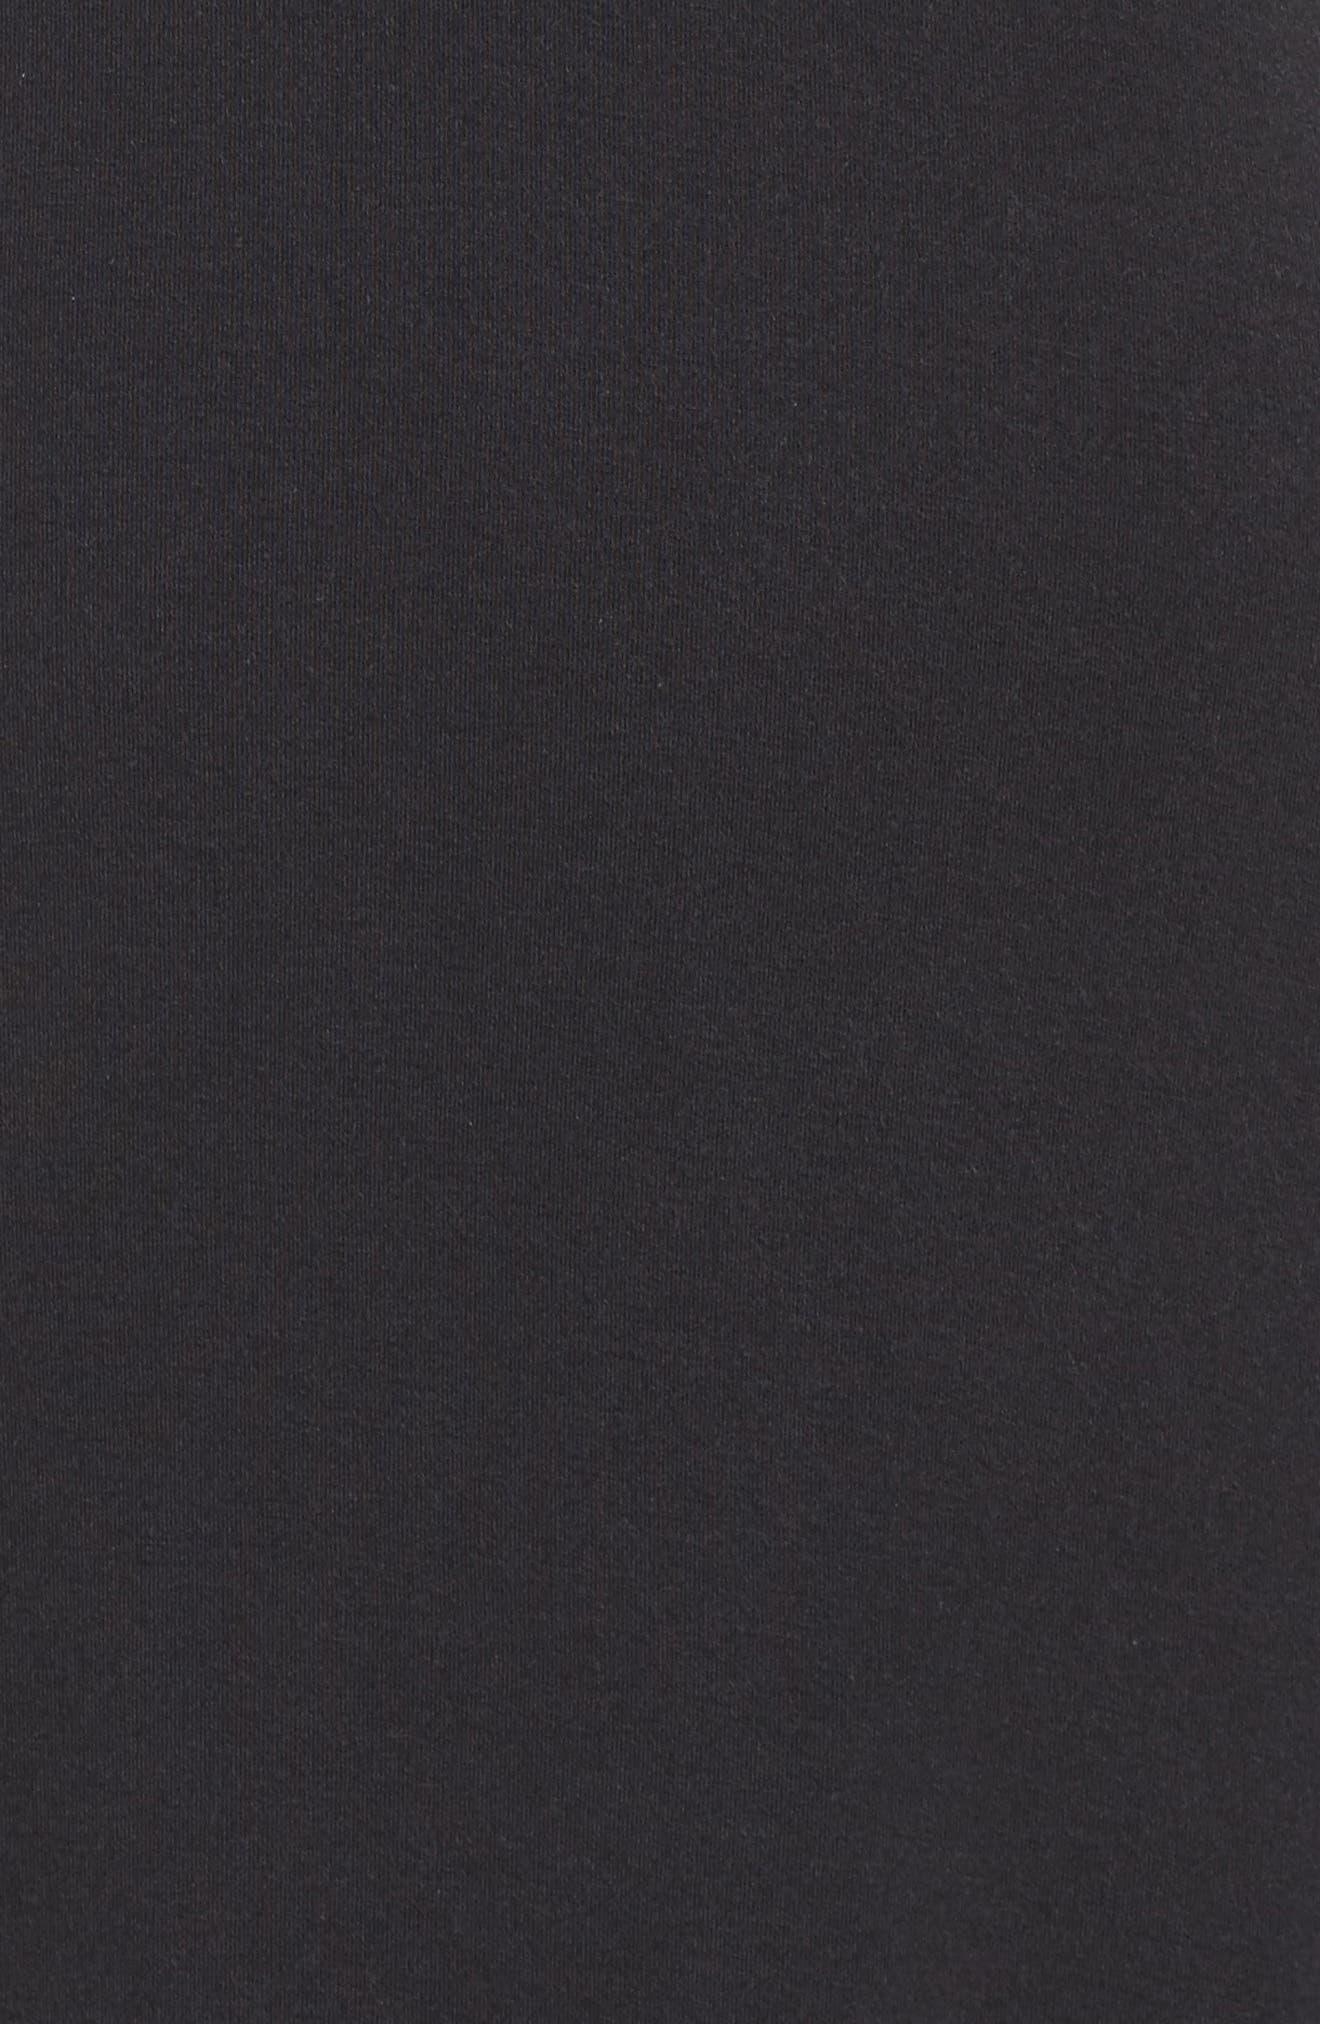 Ballet Nightgown,                             Alternate thumbnail 5, color,                             BLACK/ BLACK